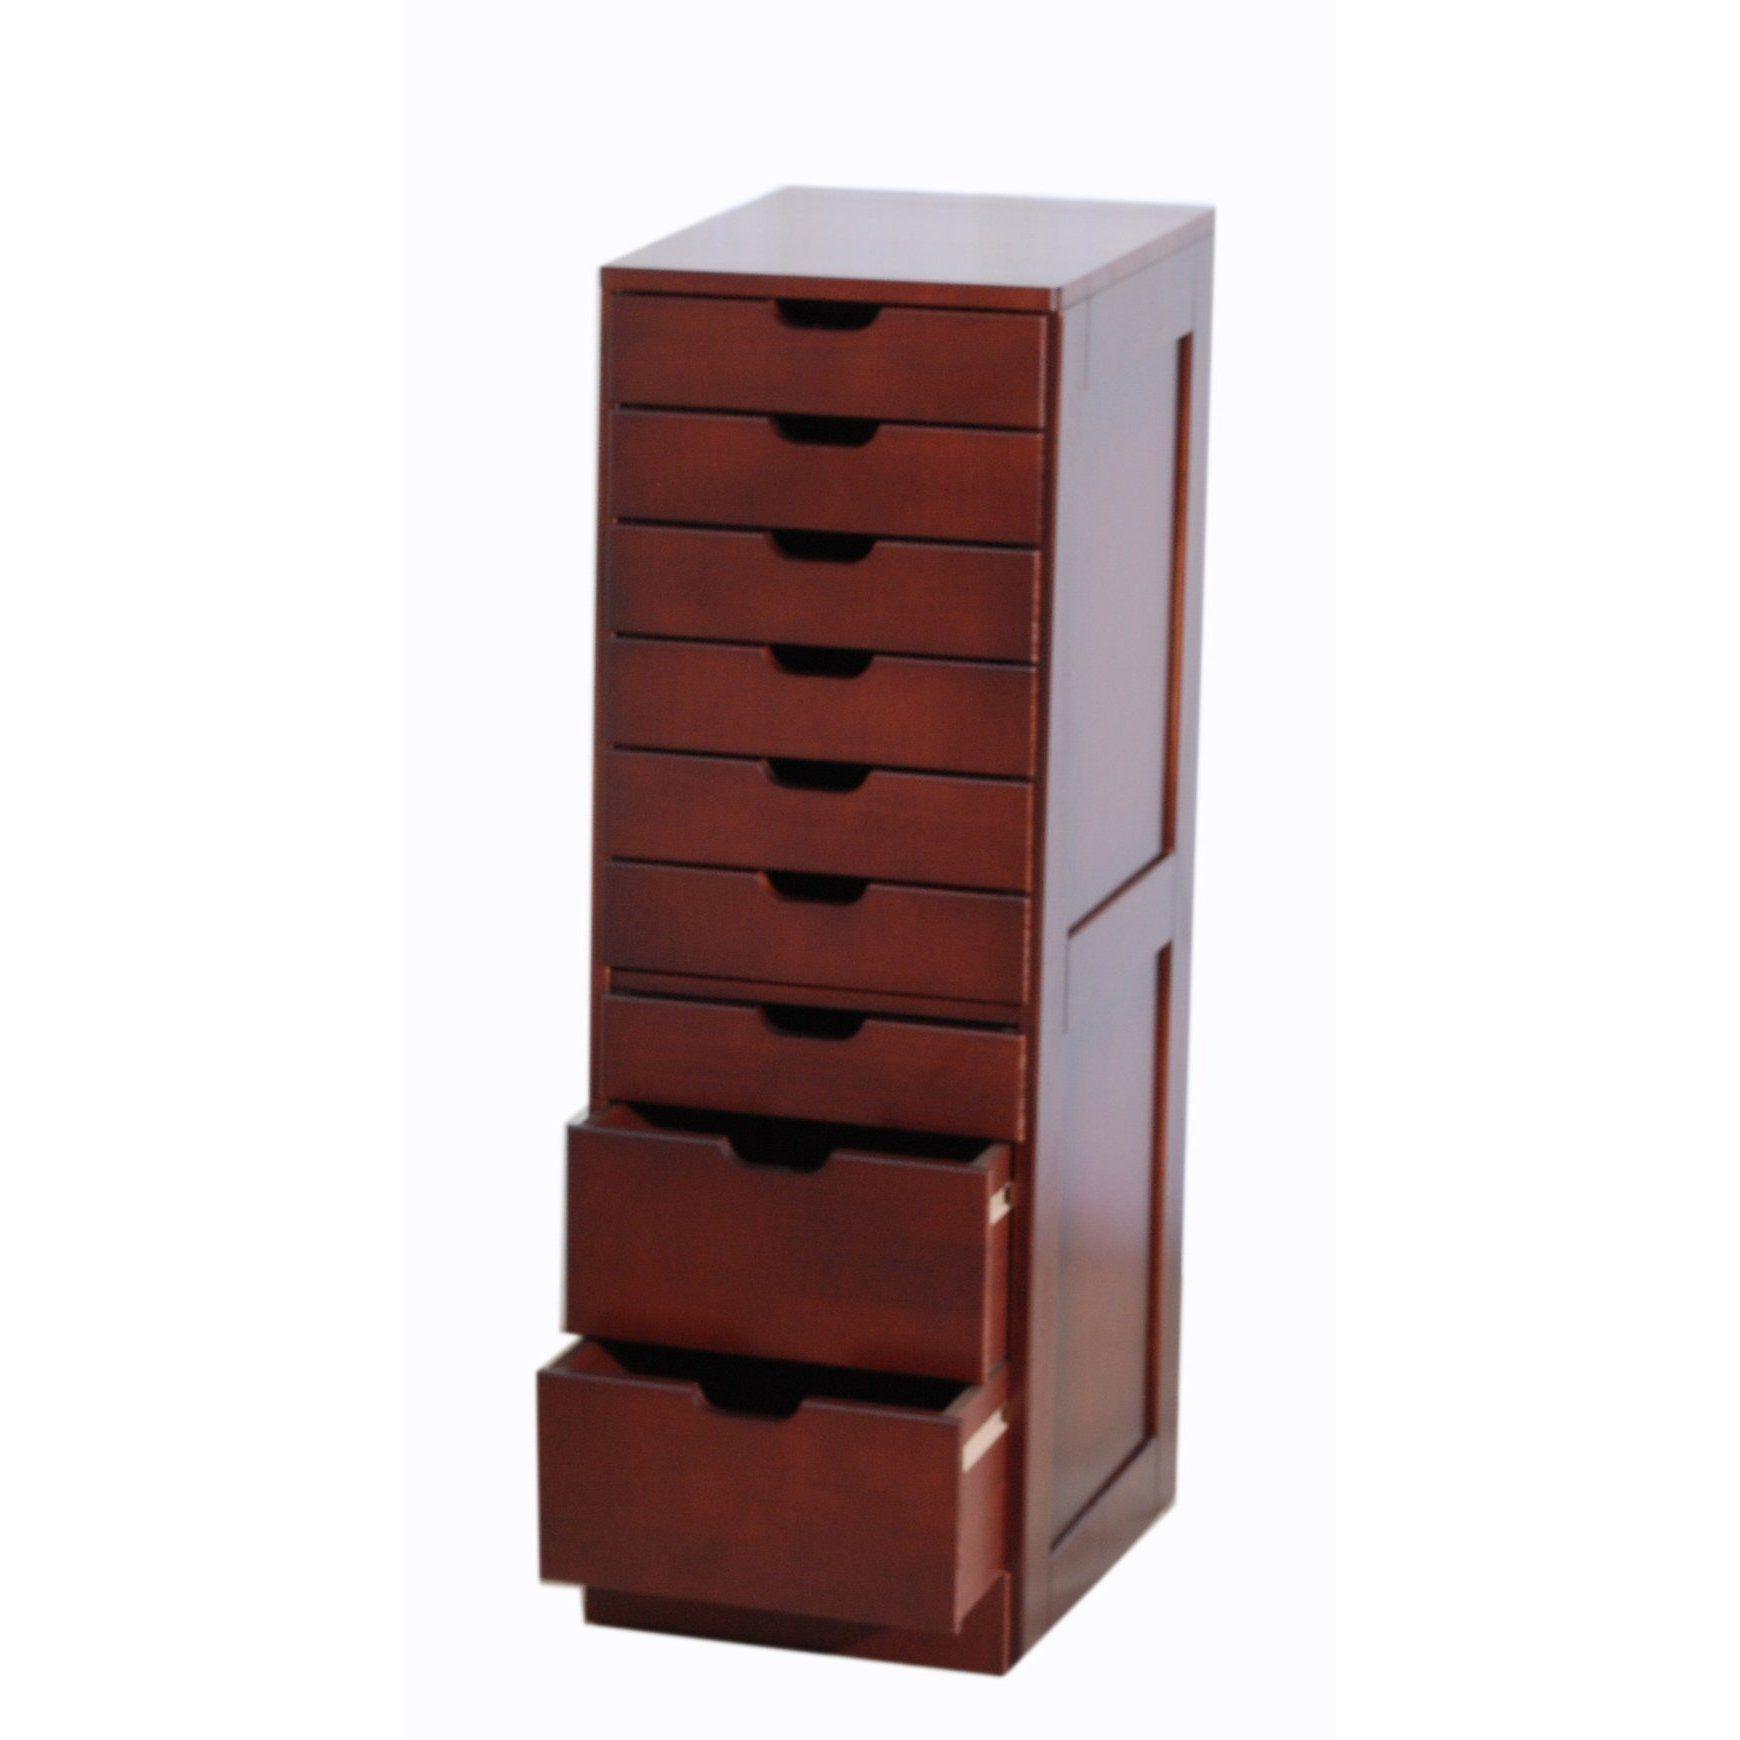 Best Furnituremaxx Cherry Finish 9 Drawers File Cabinet 400 x 300